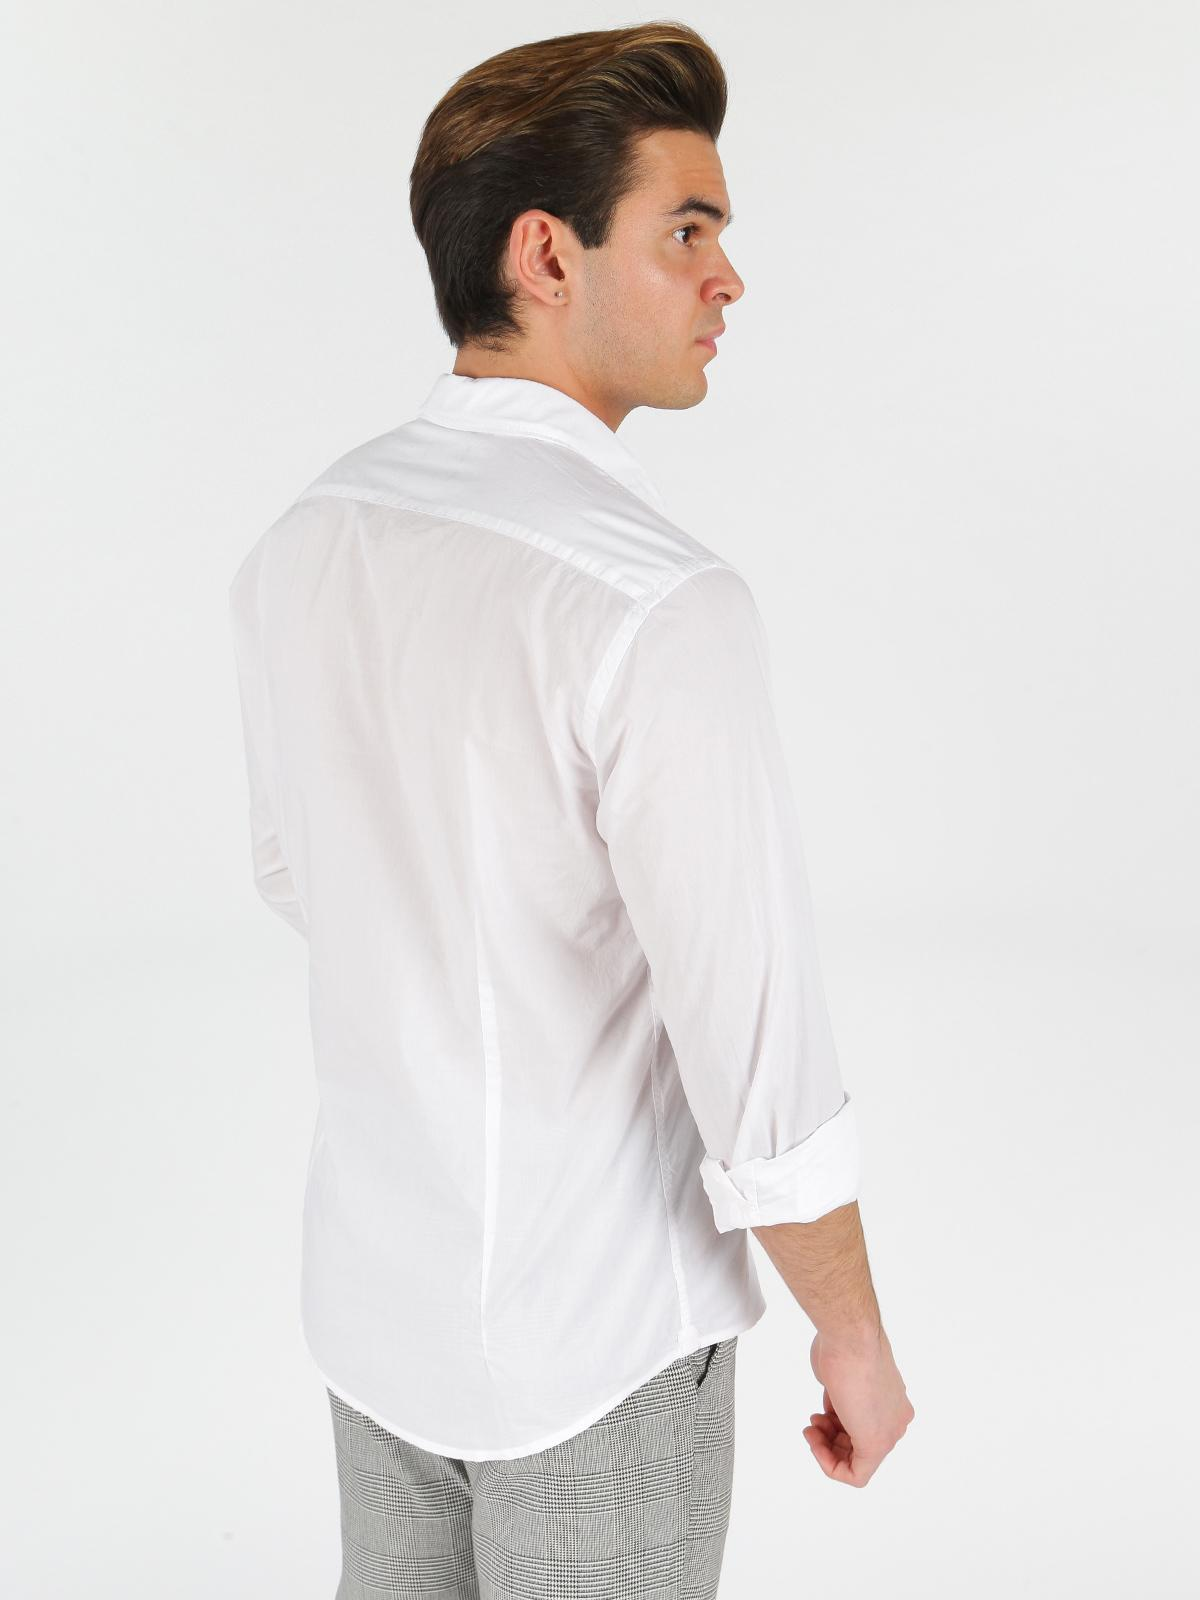 size 40 5fc08 74bb7 Camicia bianca a maniche lunghe b-style | MecShopping